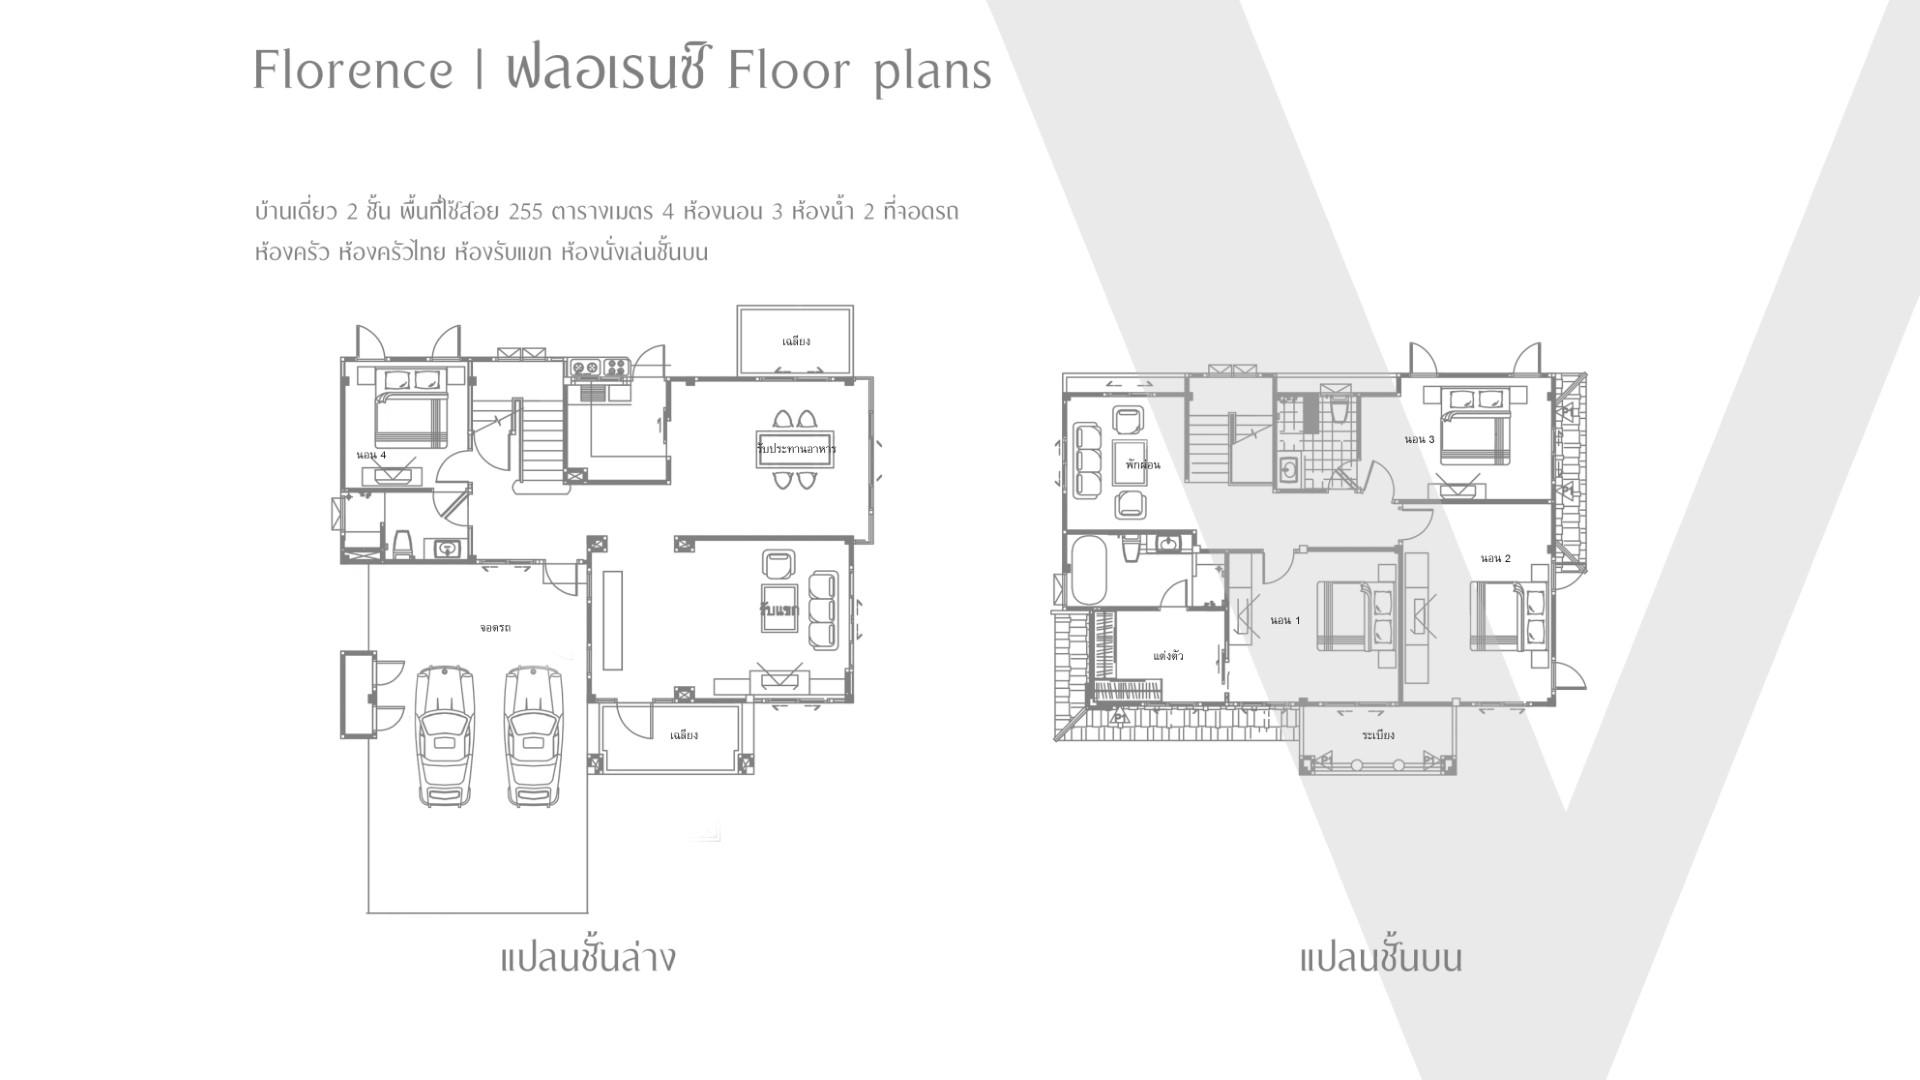 florence floor plan เดอะเวนิส พาร์ค โคราช